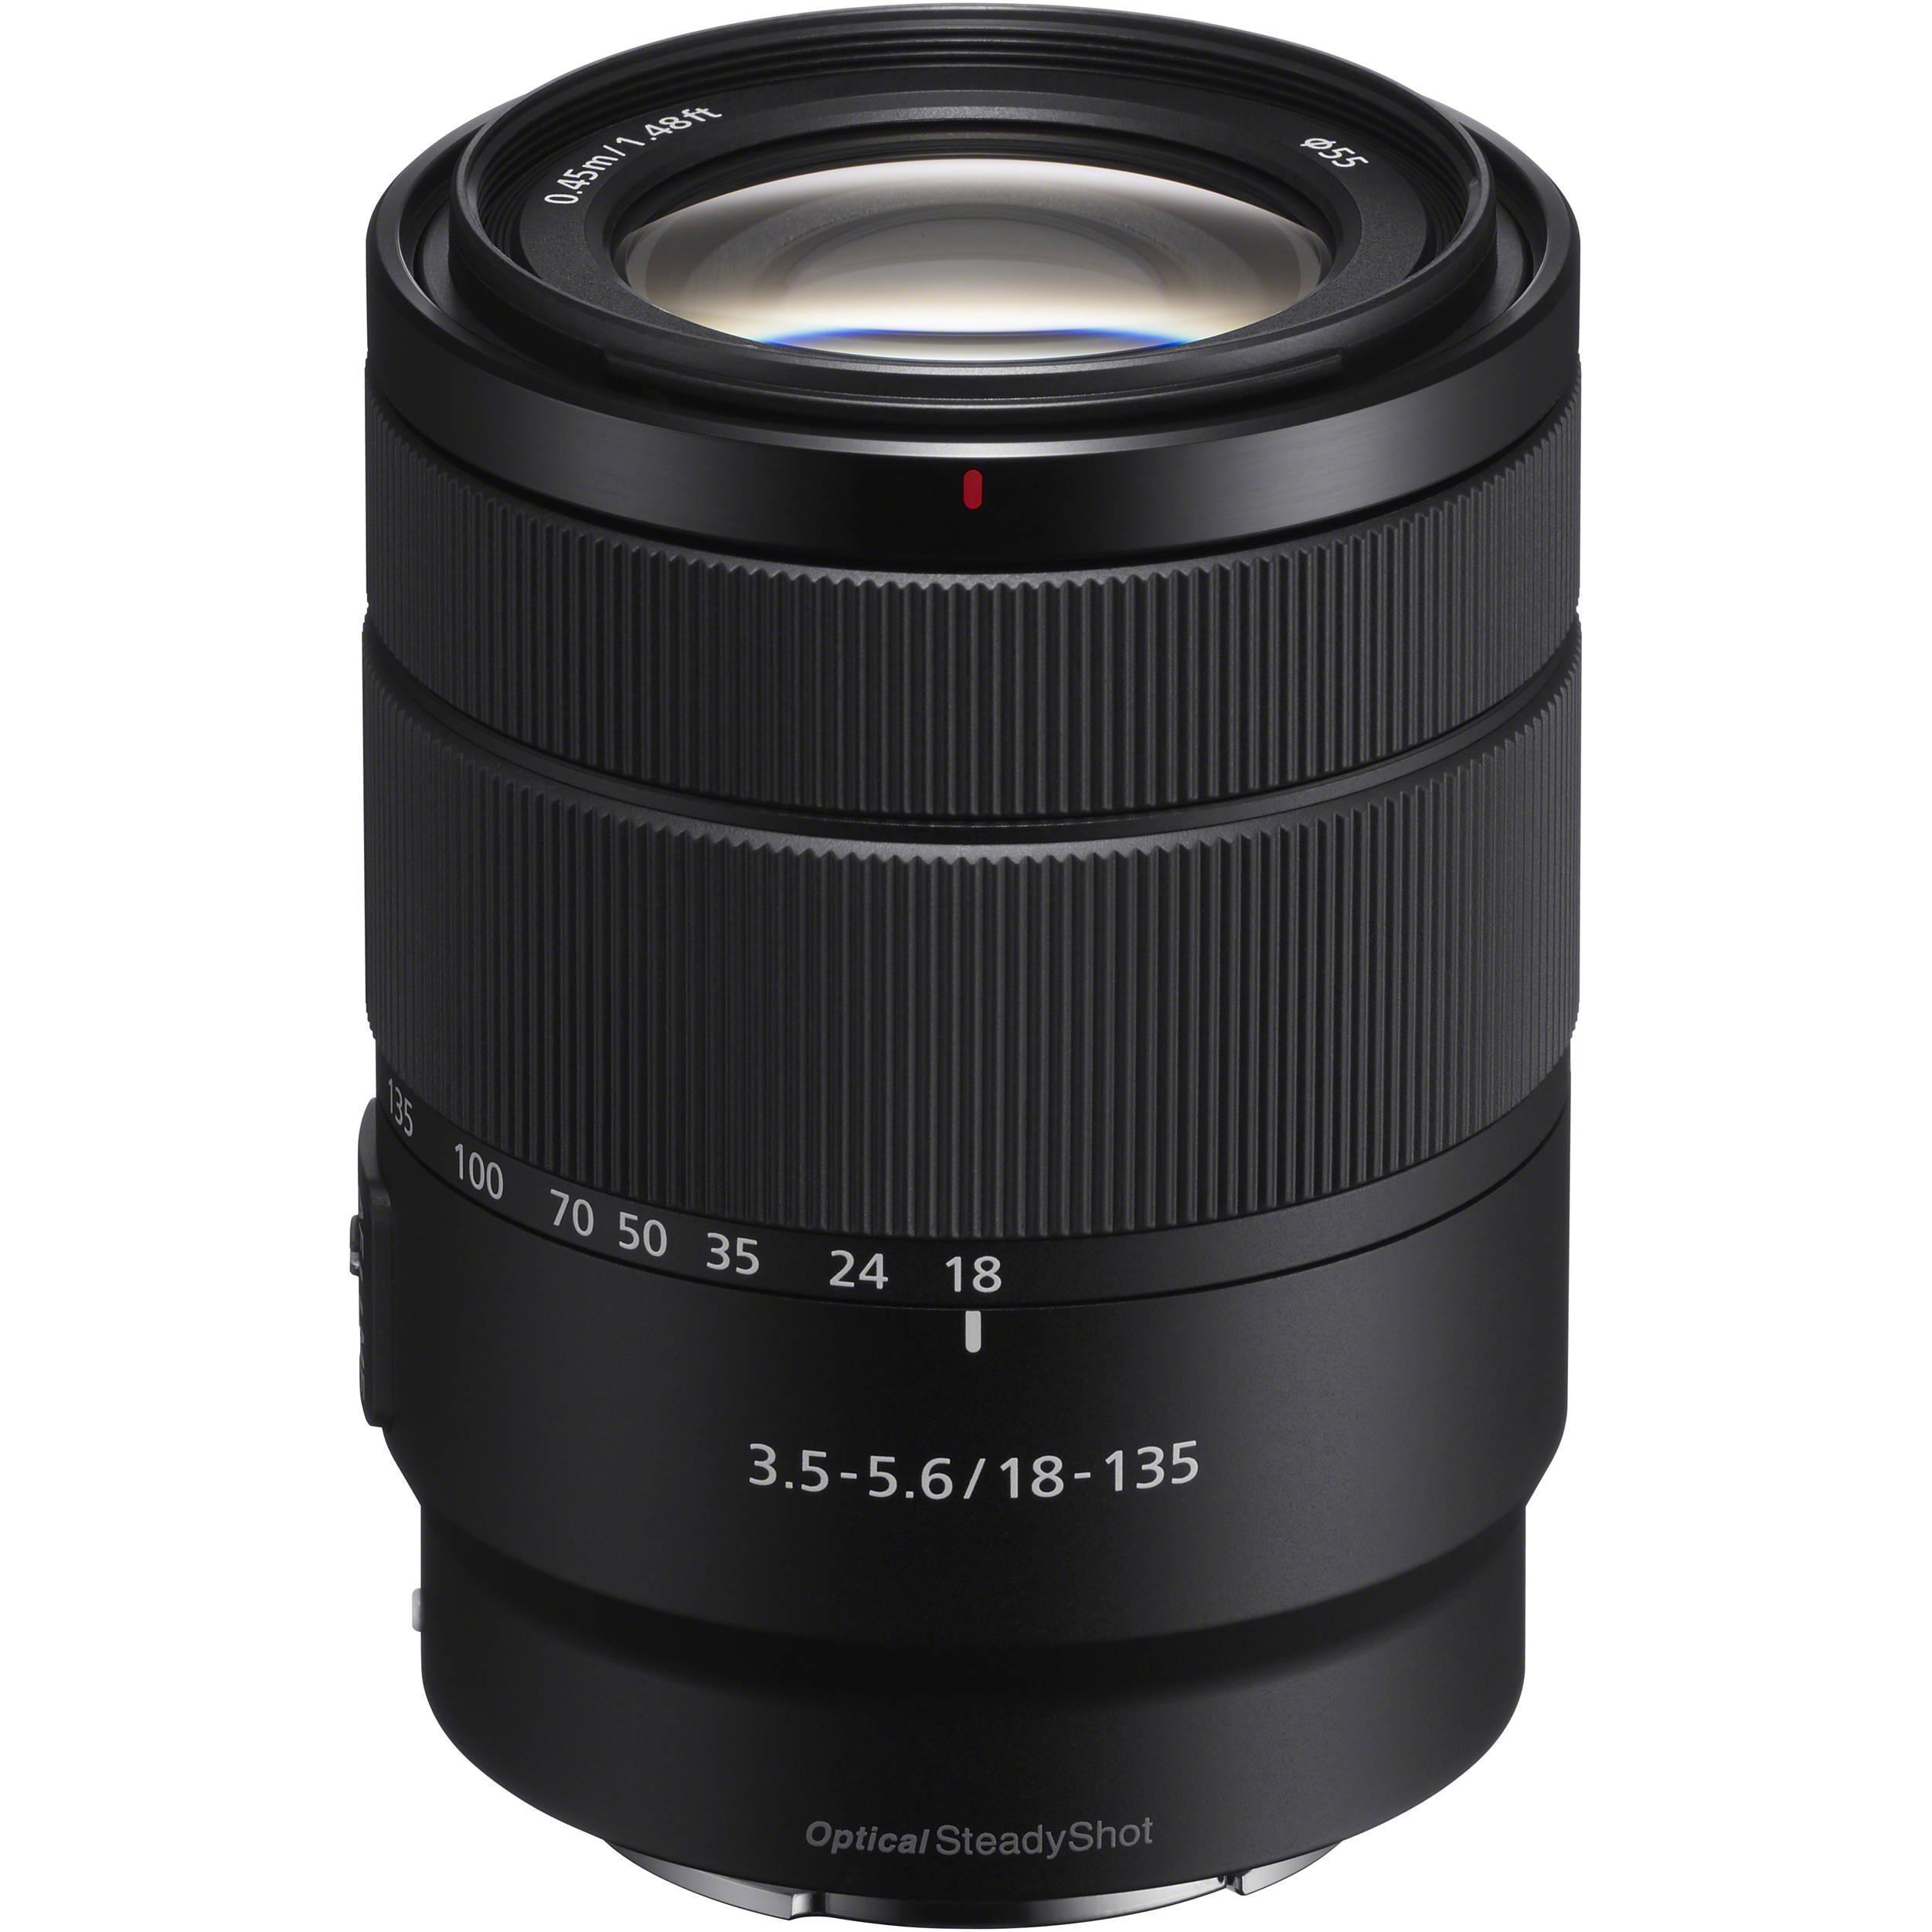 Camera Lense E 18-135mm f/3.5-5.6